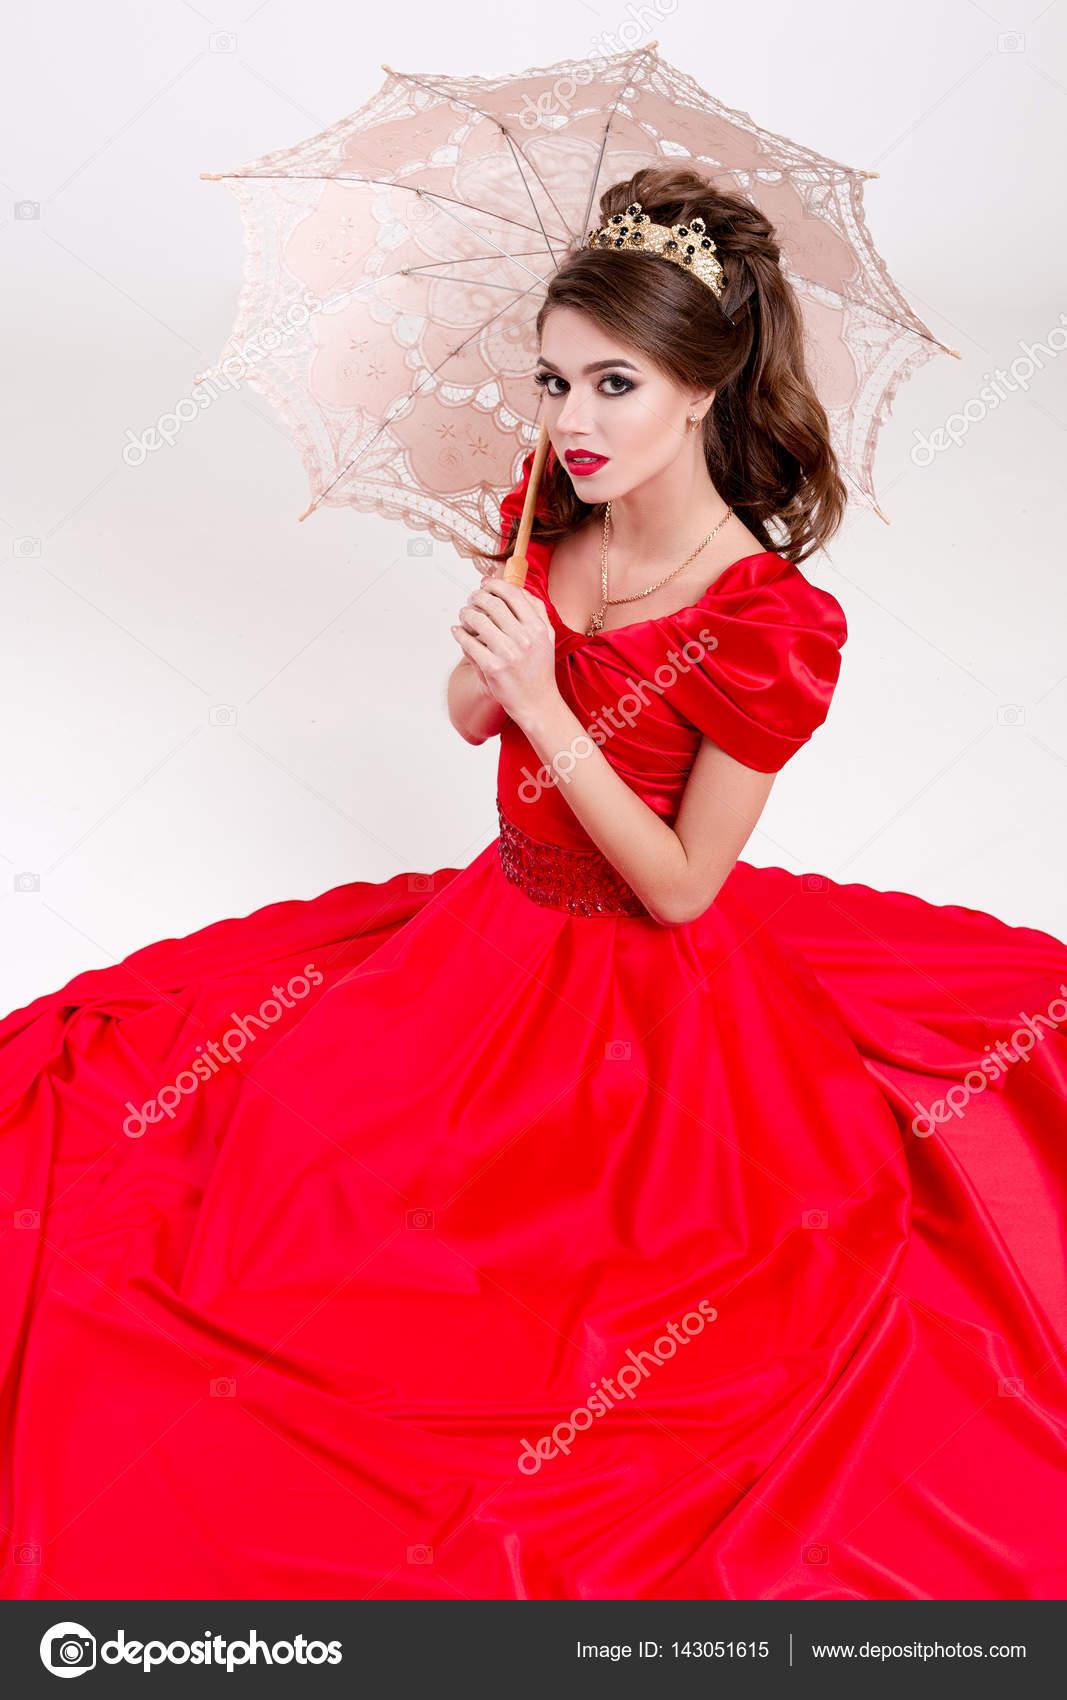 36ce5eb78191 Κομψή γυναίκα σε ένα μακρύ κόκκινο φόρεμα κάθεται στο πάτωμα και κρατώντας  μια ομπρέλα vintage– εικόνα αρχείου